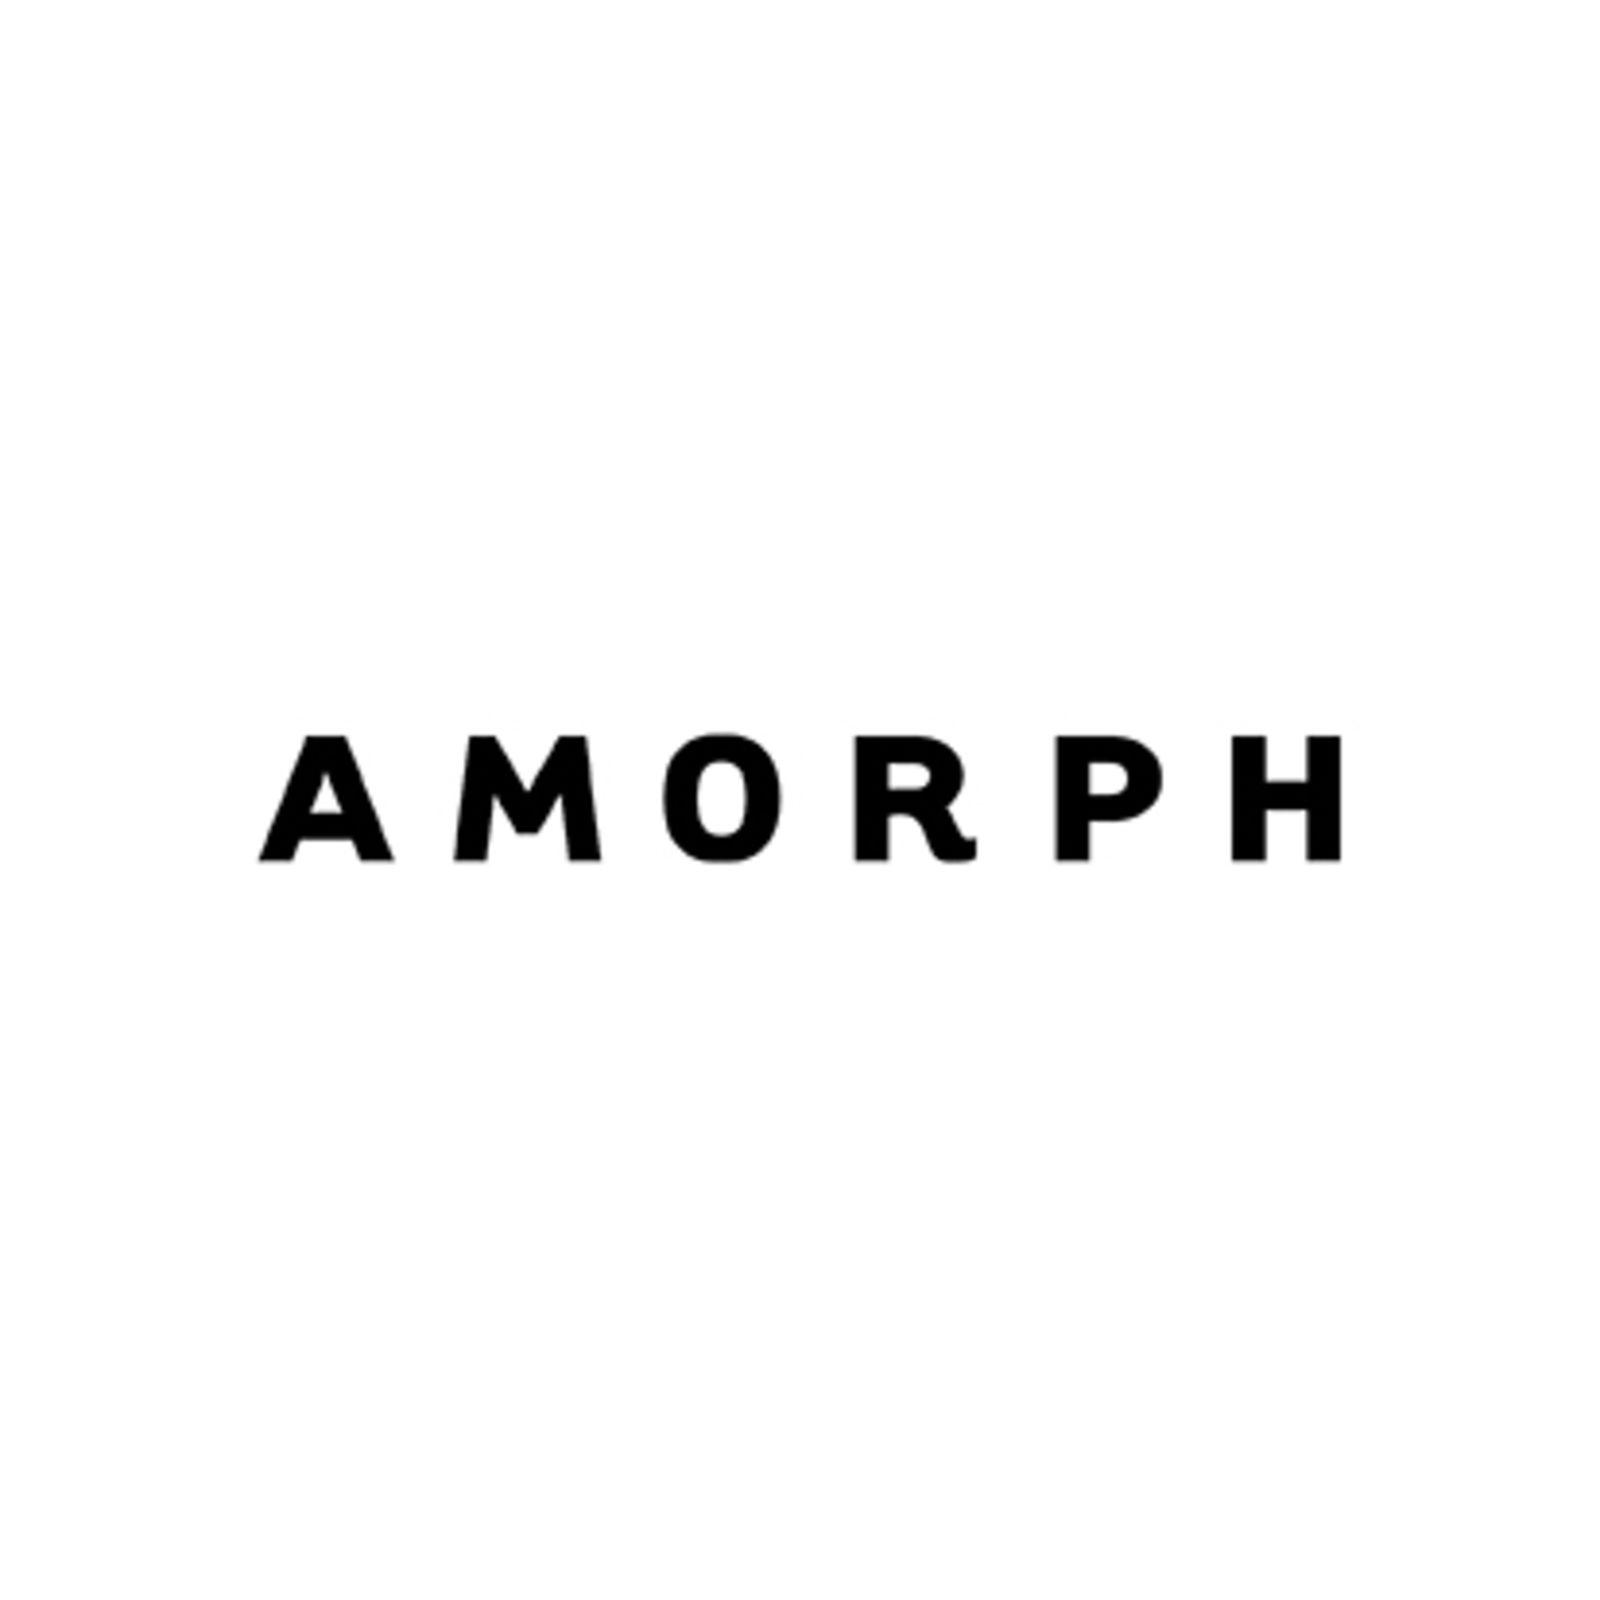 AMORPH (Bild 3)